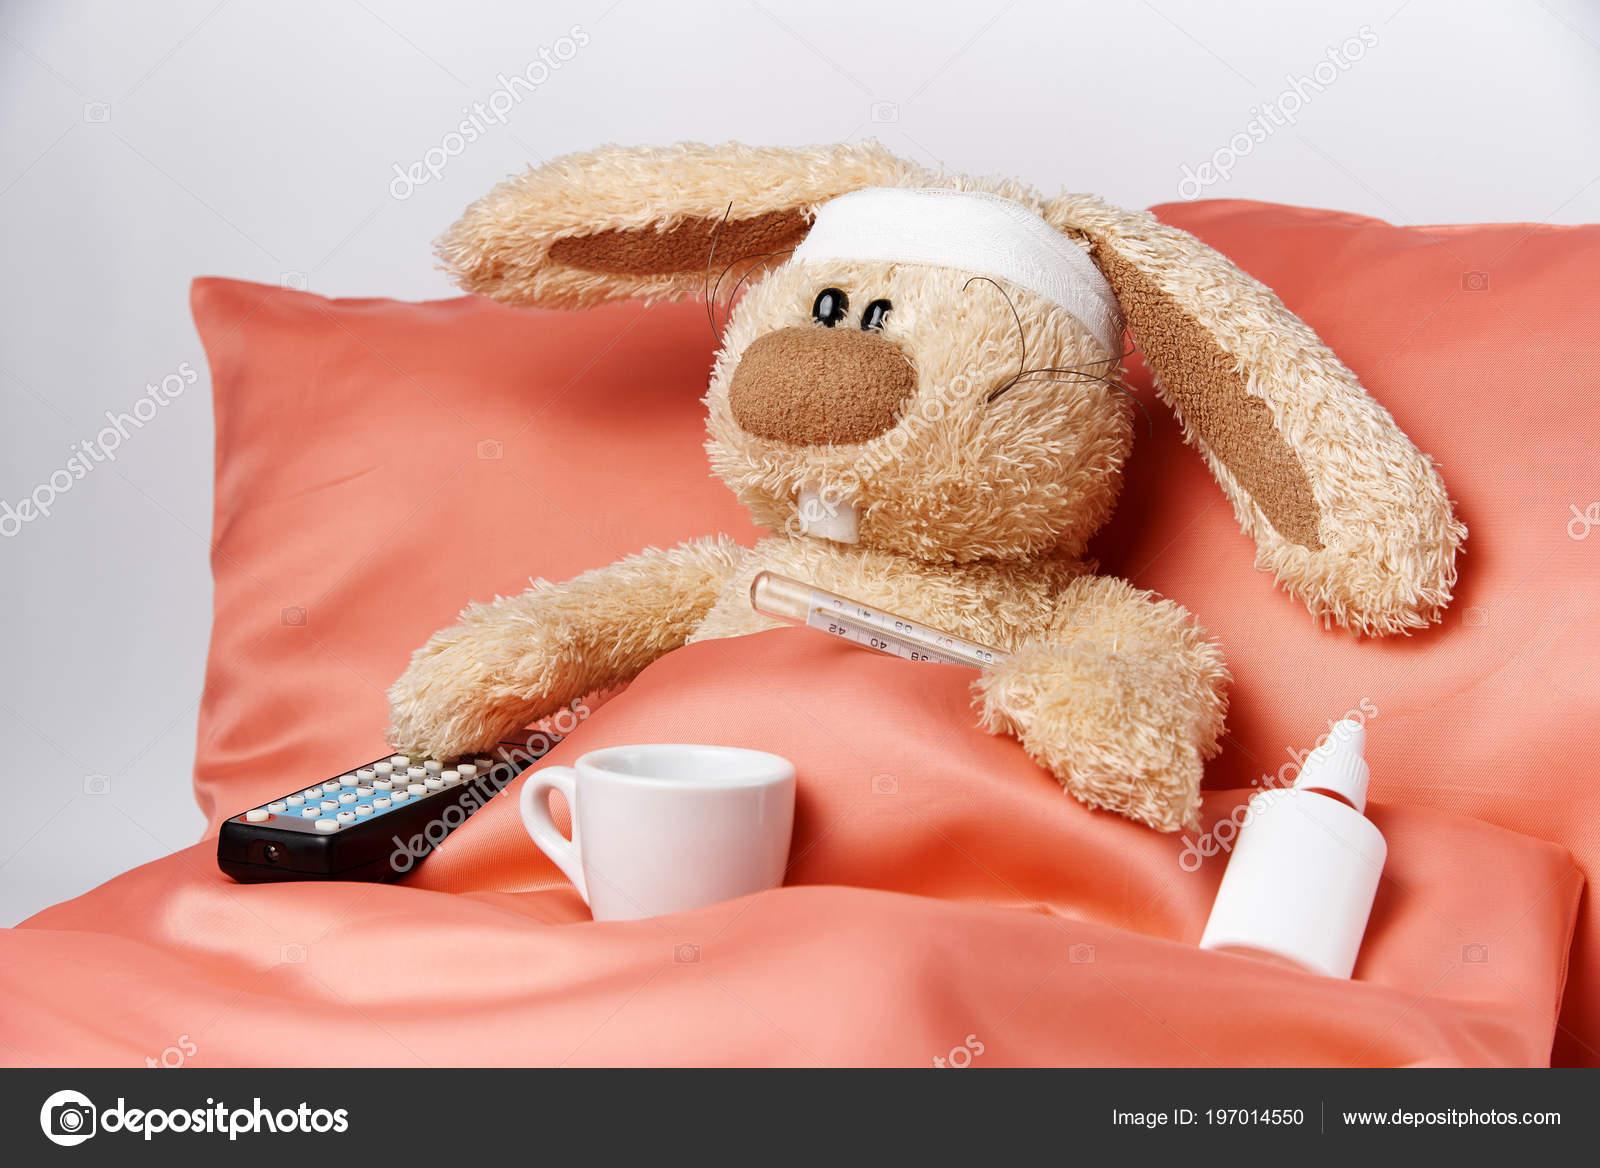 Un smiley pour ton humeur ! - Page 38 Depositphotos_197014550-stock-photo-toy-unhealthy-rabbit-thermometer-remote